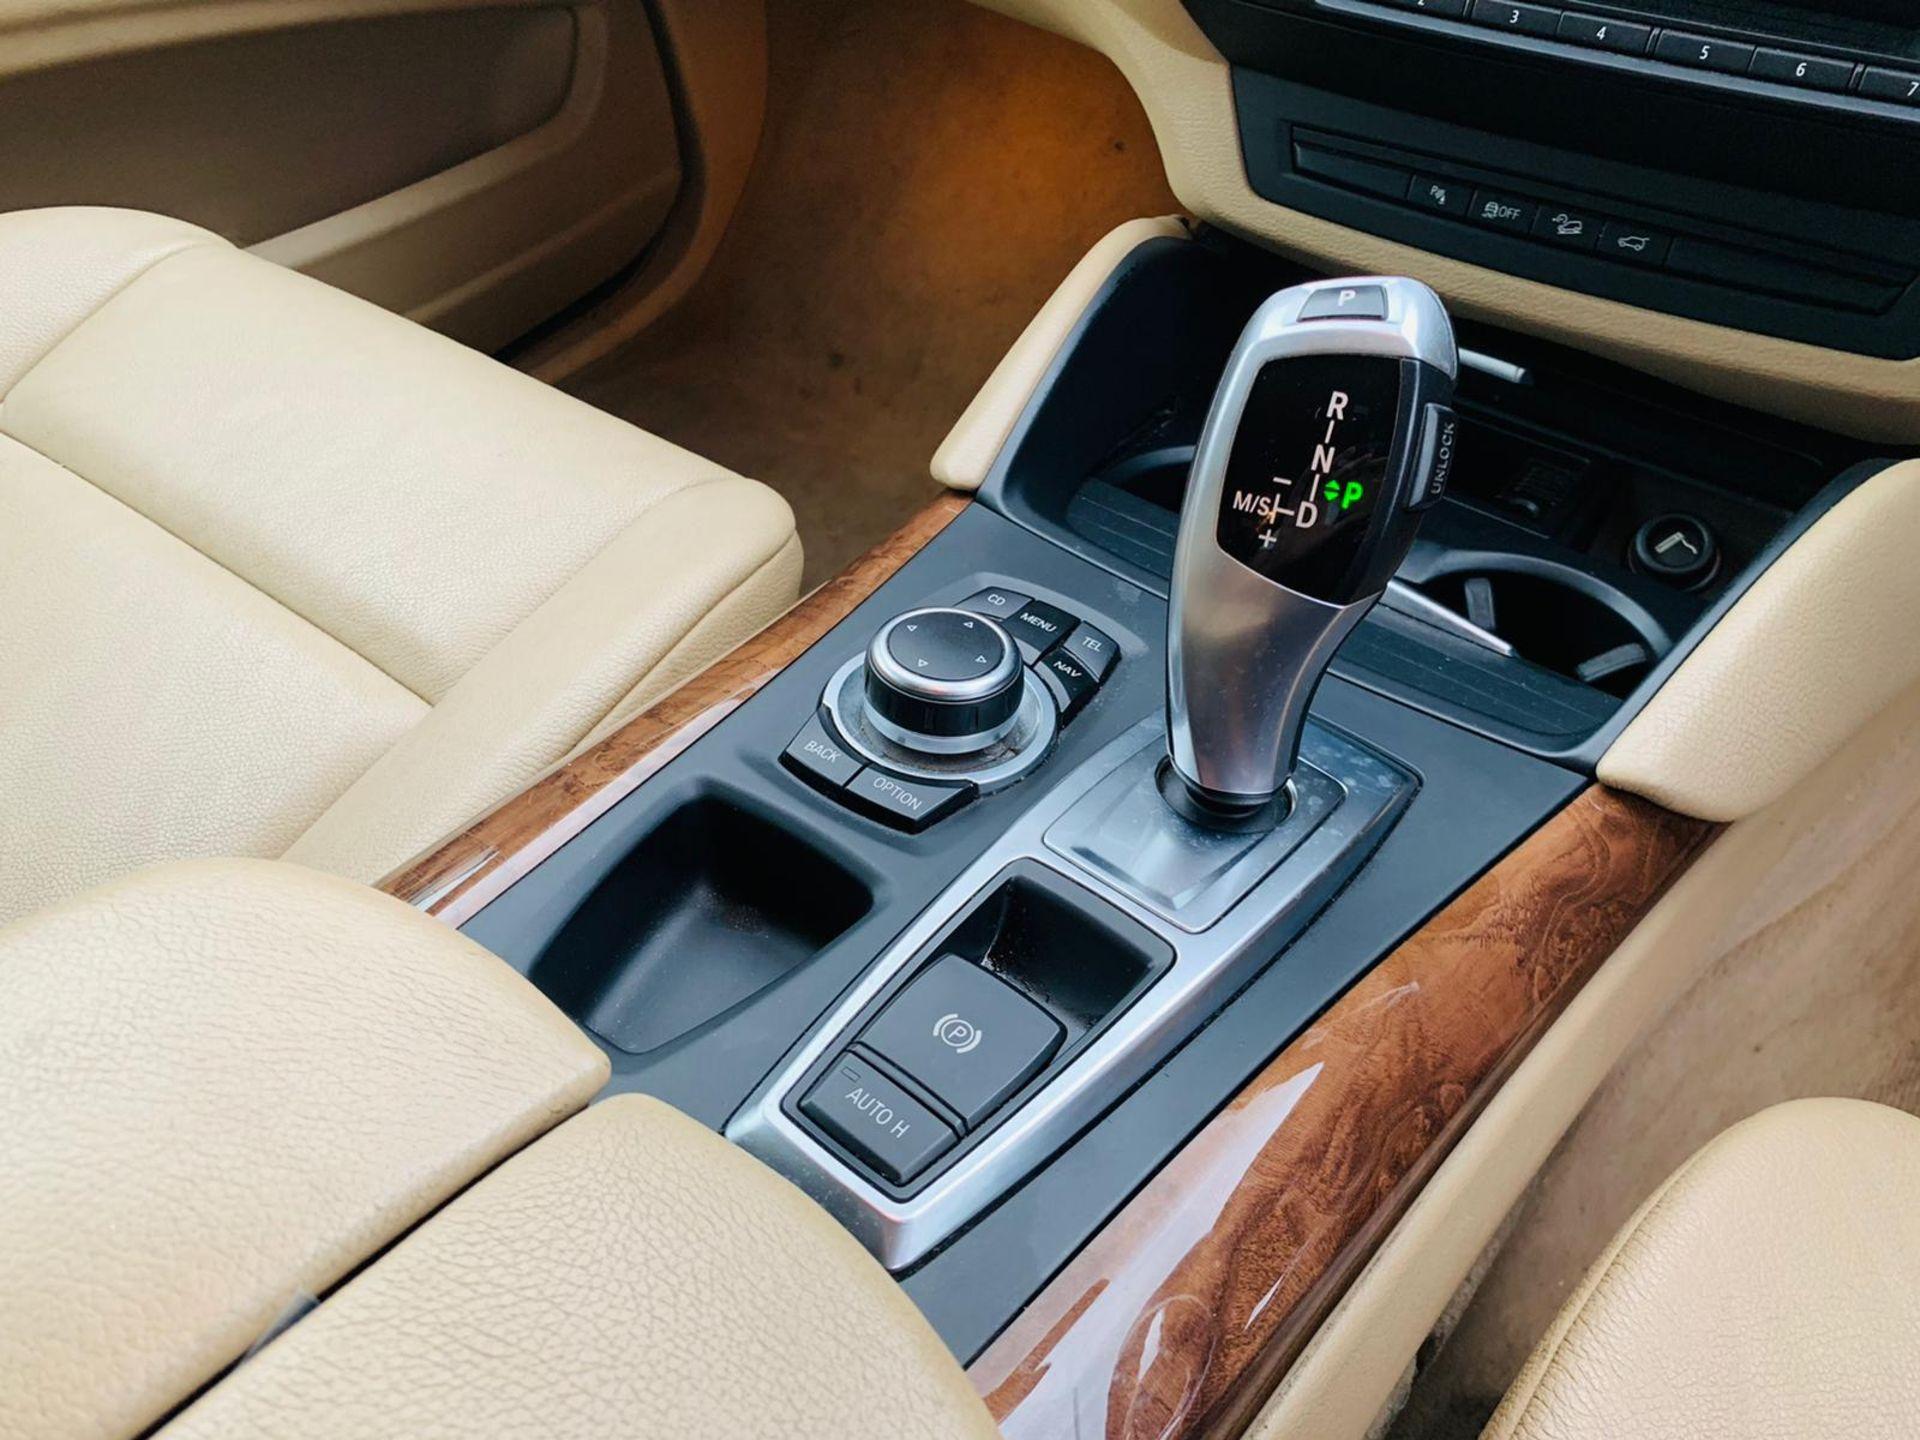 Reseve Met - BMW X6 xDrive 3.0d Auto - 2014 Reg - Leather Interior -Parking Sensors - Reversing Cam - Image 21 of 30